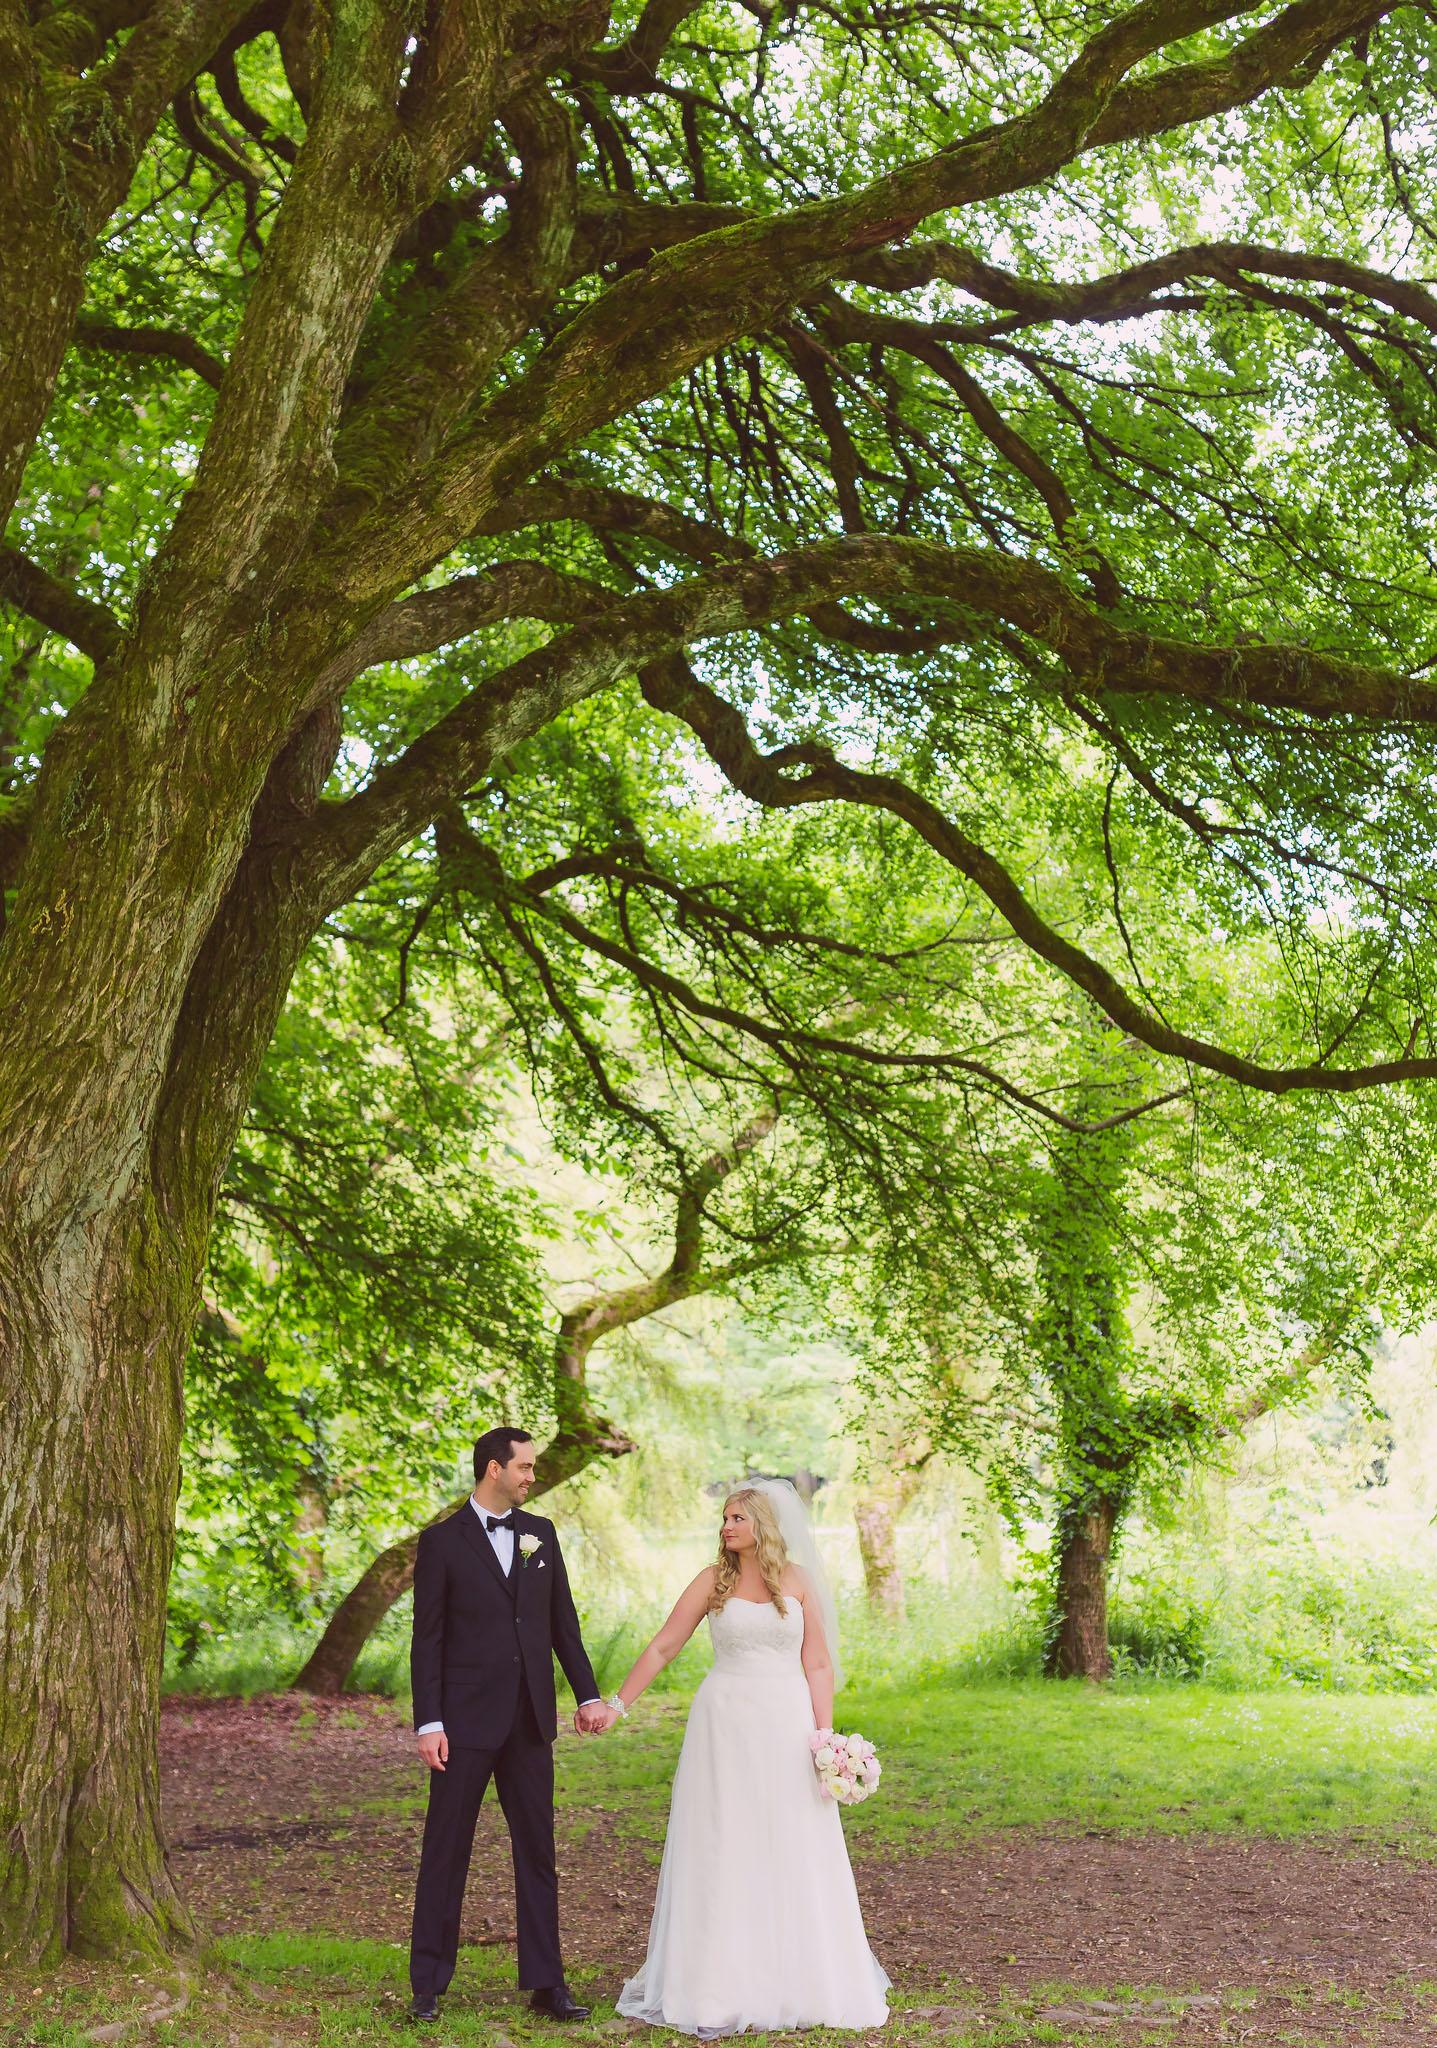 IMG_6189-VANCOUVER-WEDDING-JENNIFER-PICARD-PHOTOGRAPHY.jpg